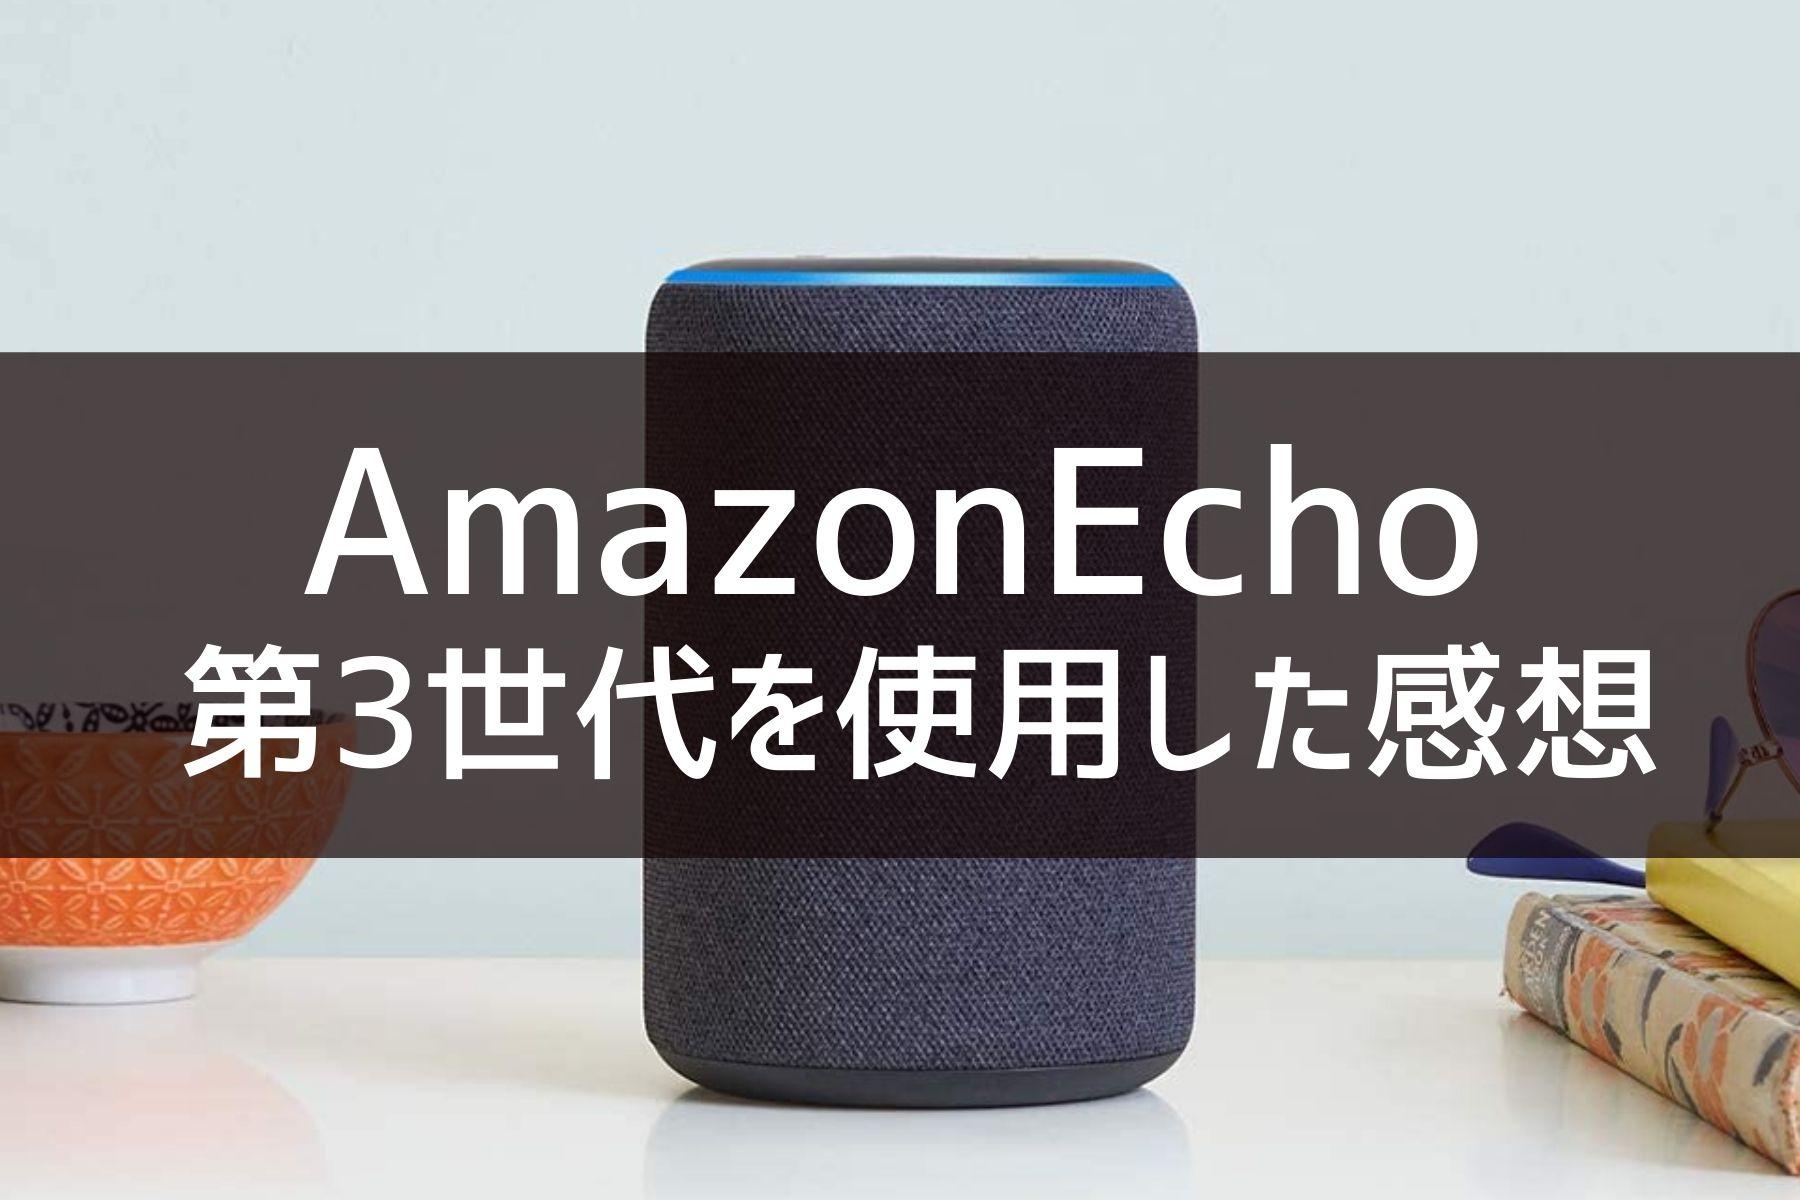 Echo (エコー) 第3世代を使った感想|スマートスピーカーのある生活